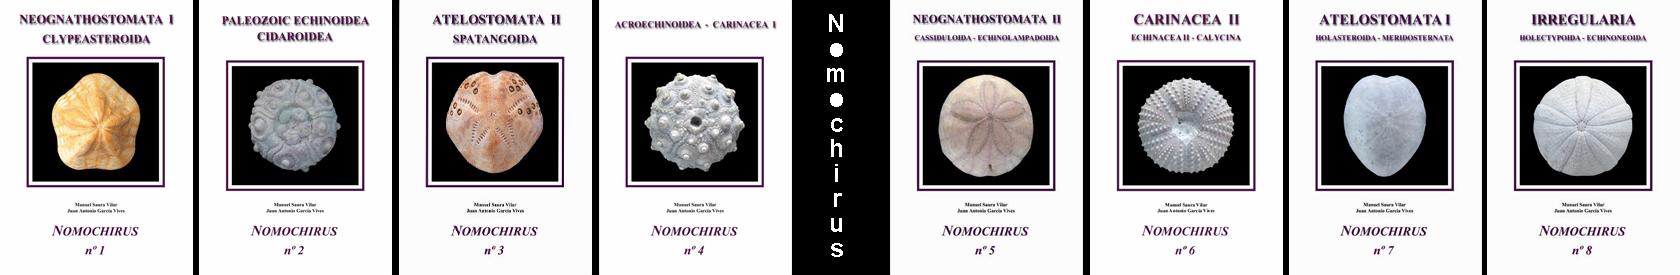 Serie monográfica NOMOCHIRUS